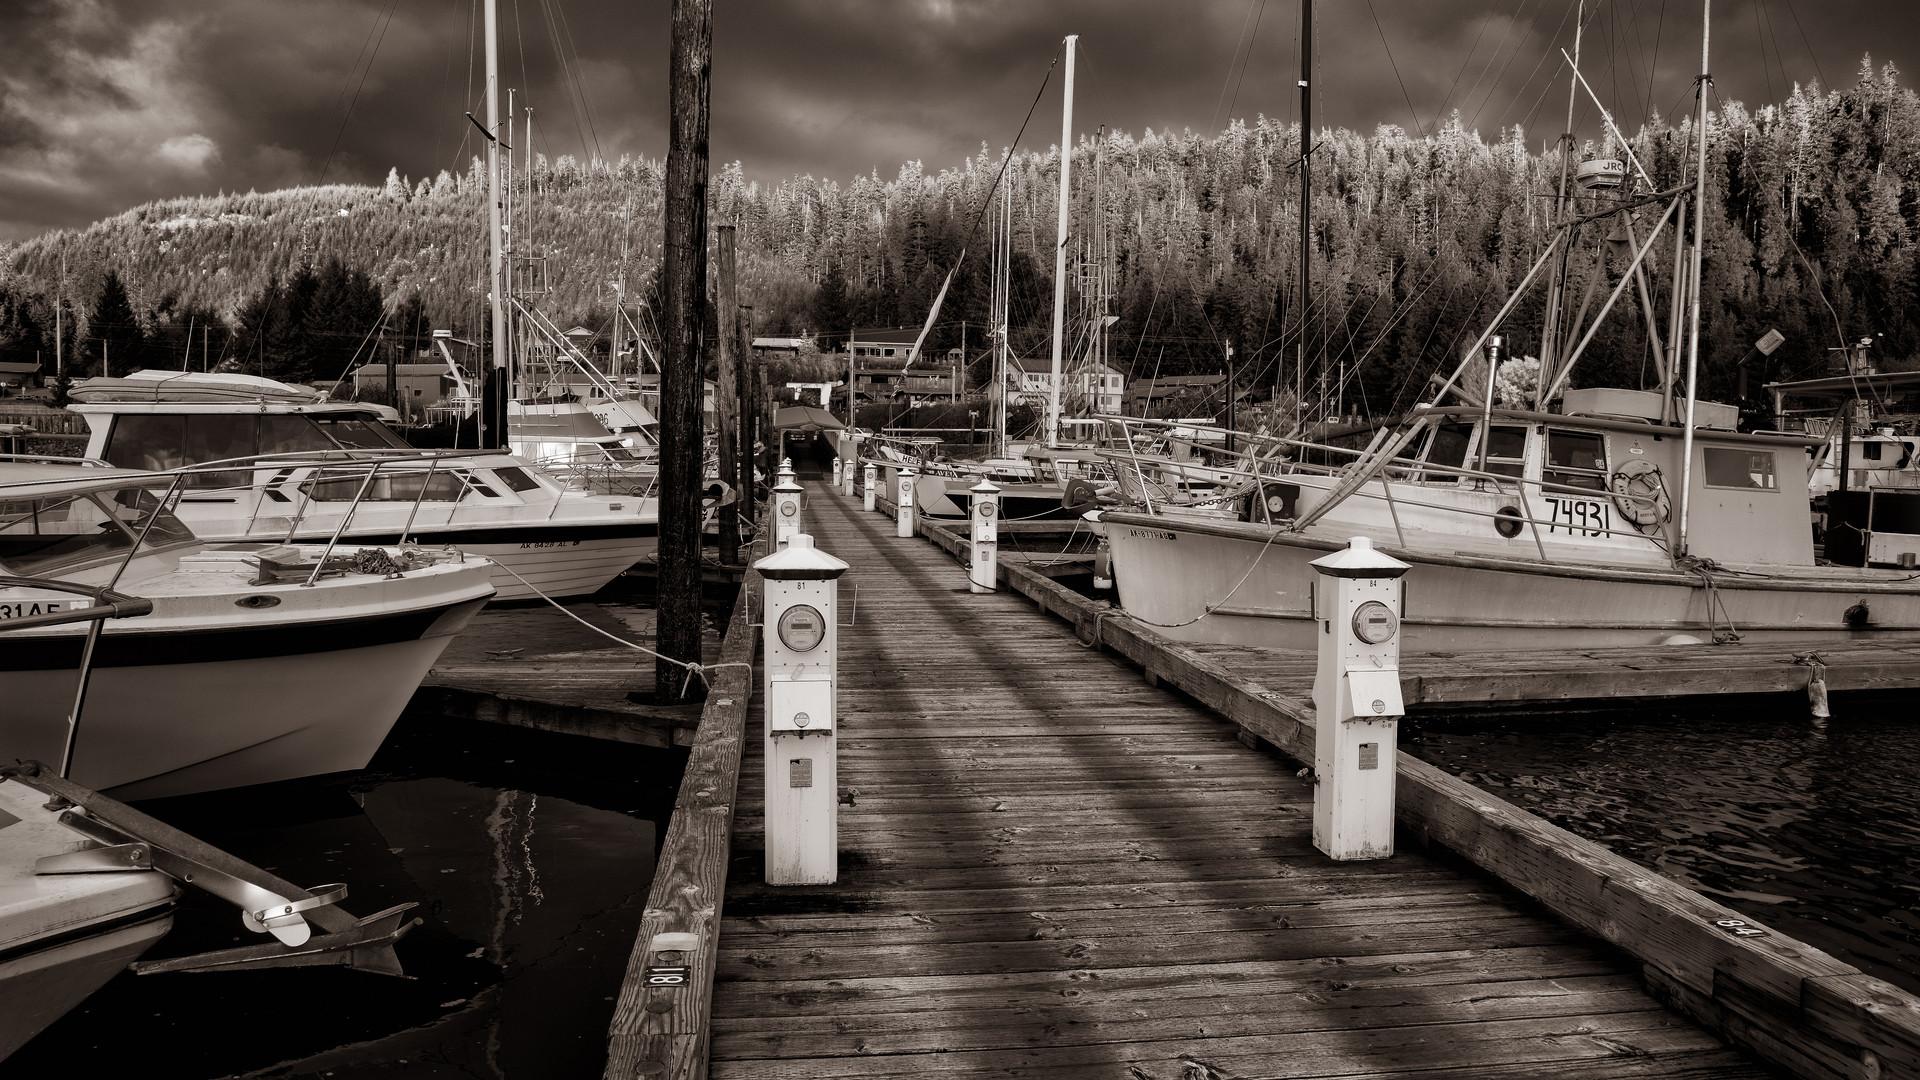 Thorne Bay Dock